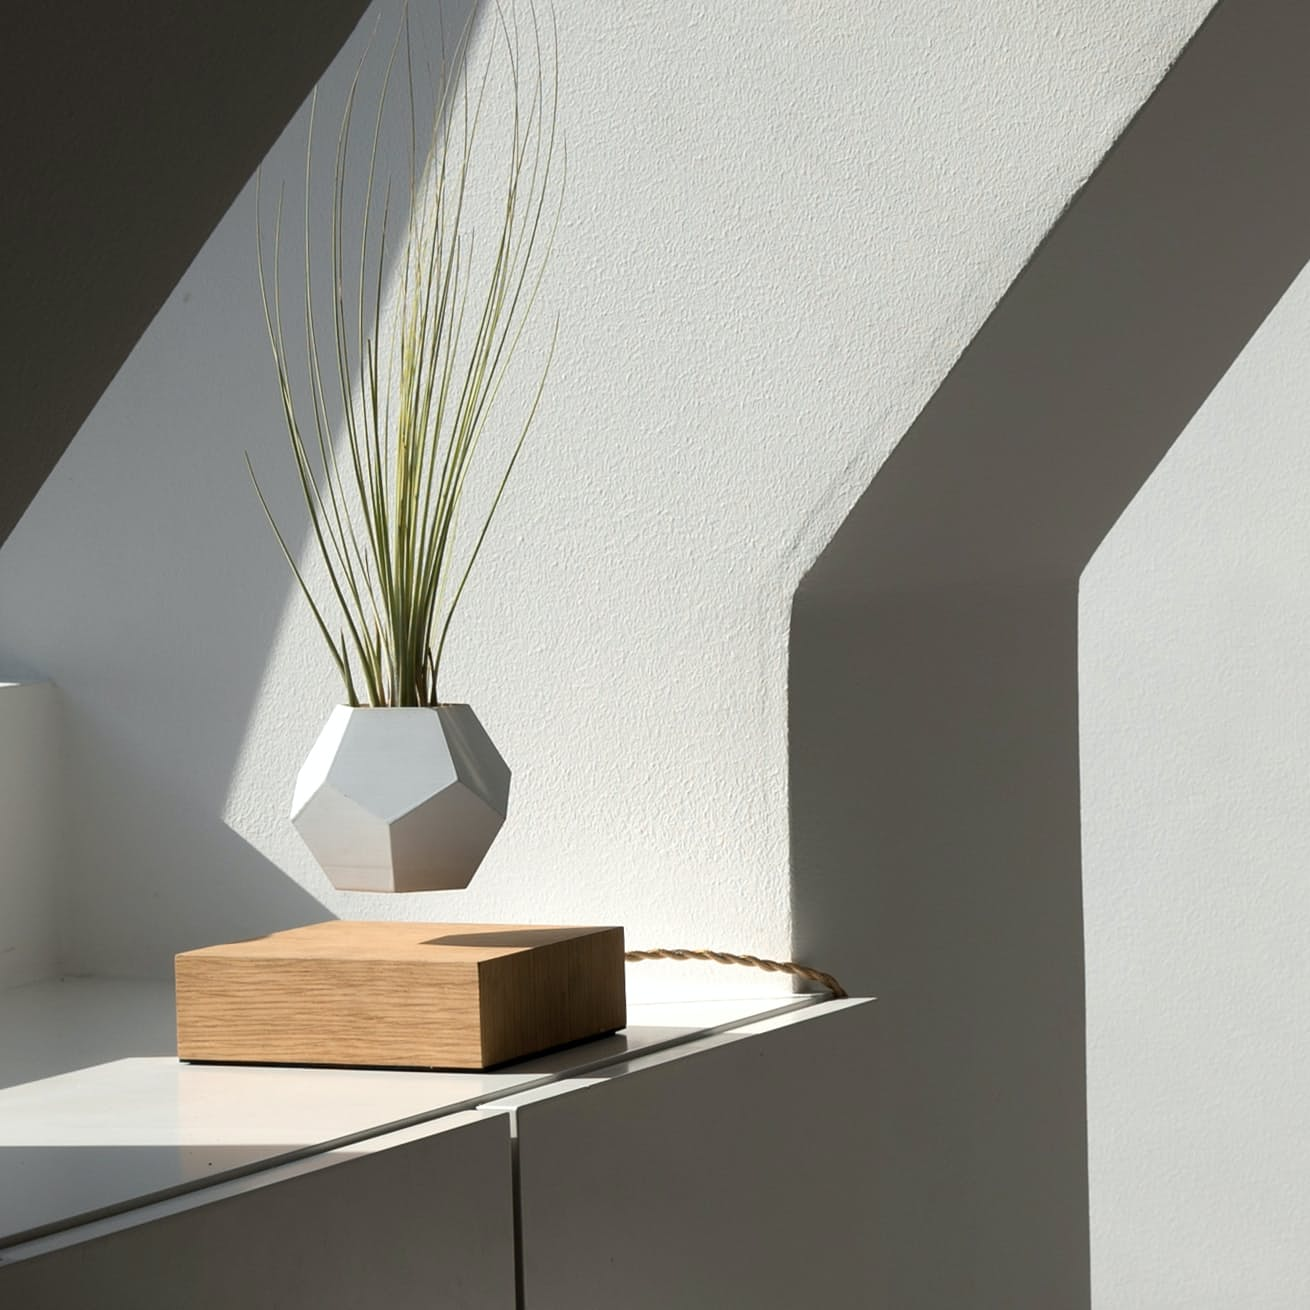 levitating furniture. levitating furniture flyte planter whiteoak p flmb inside image